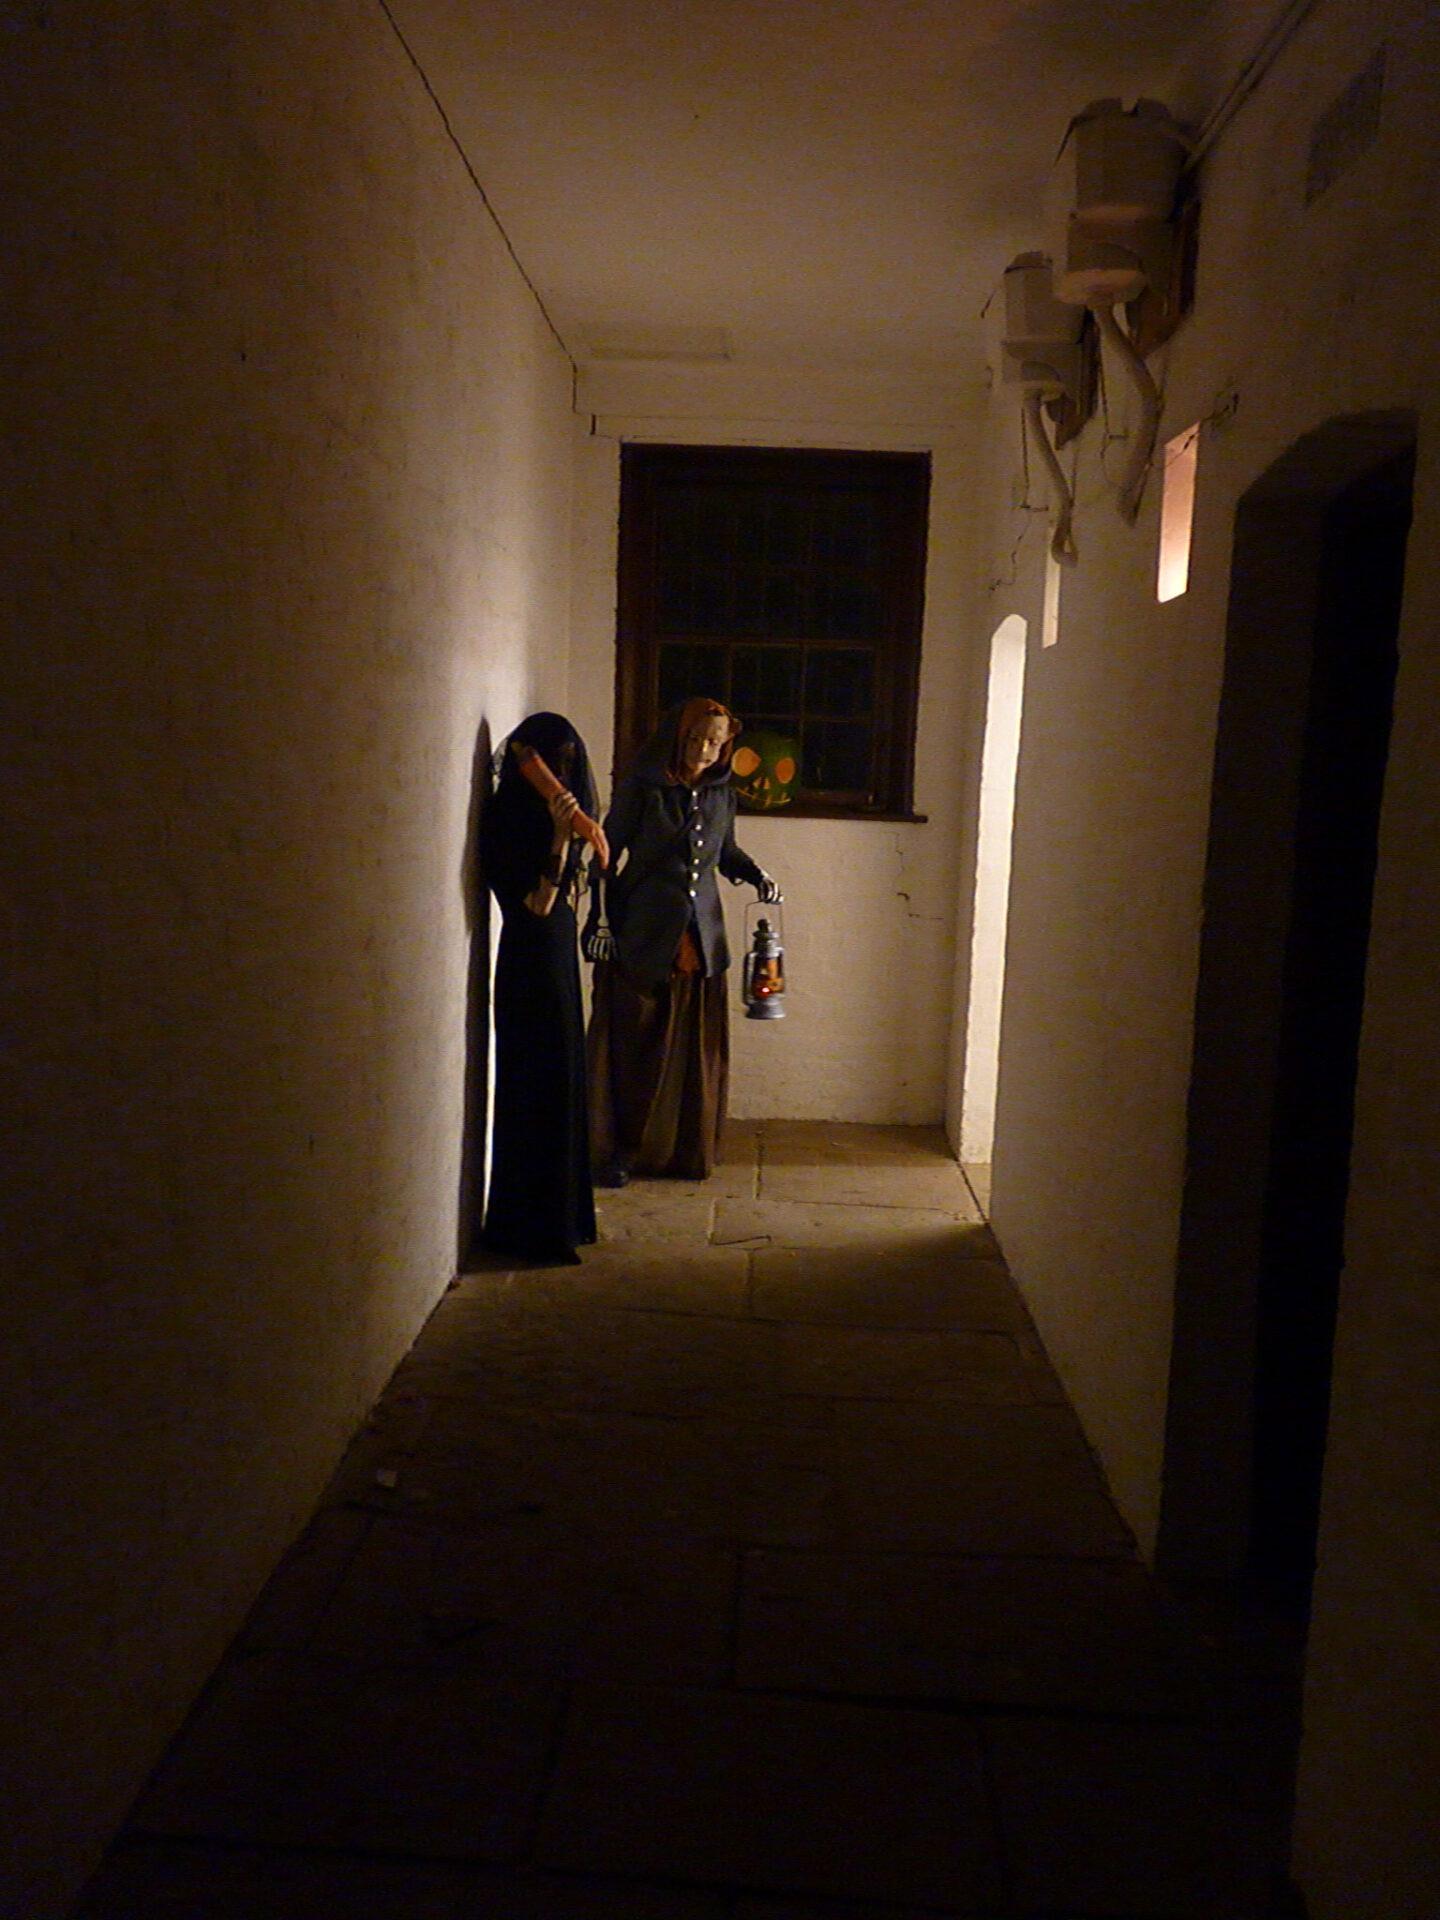 All Hallows Evening – 30th October  (18.00 – 22.00)